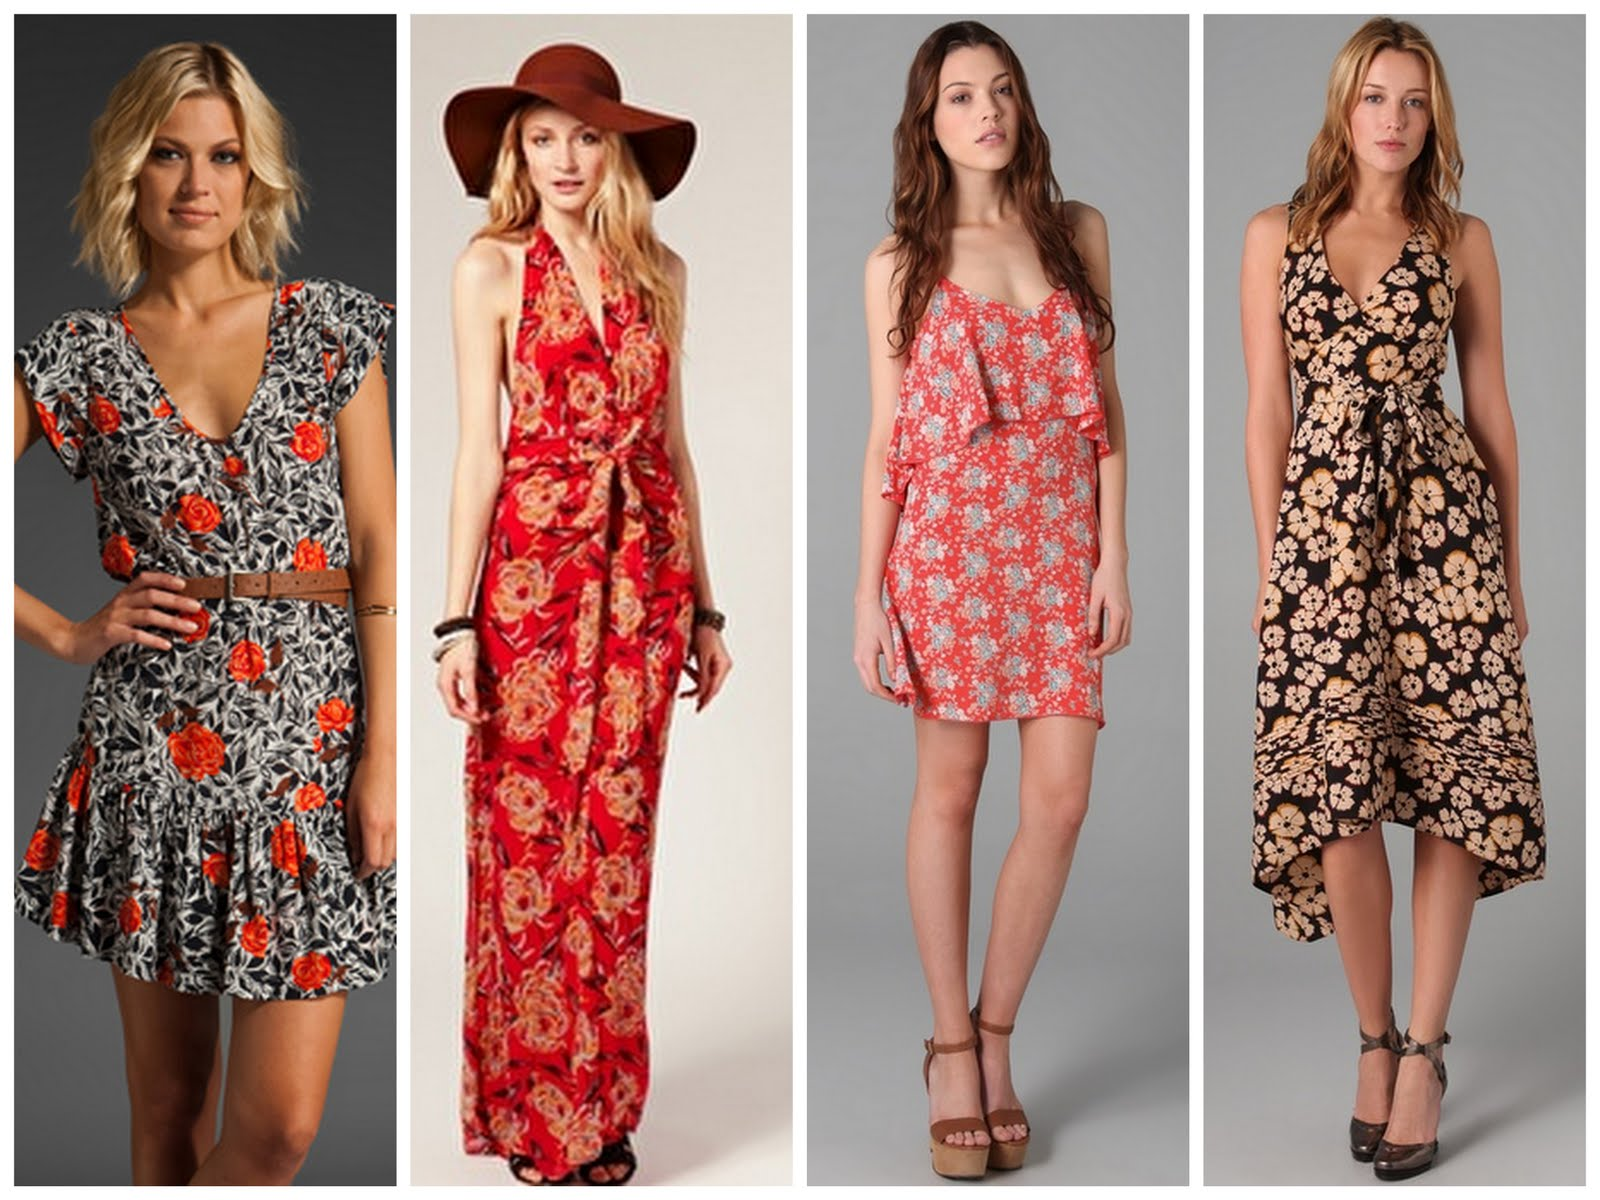 Dlugie modne sukienki (8)